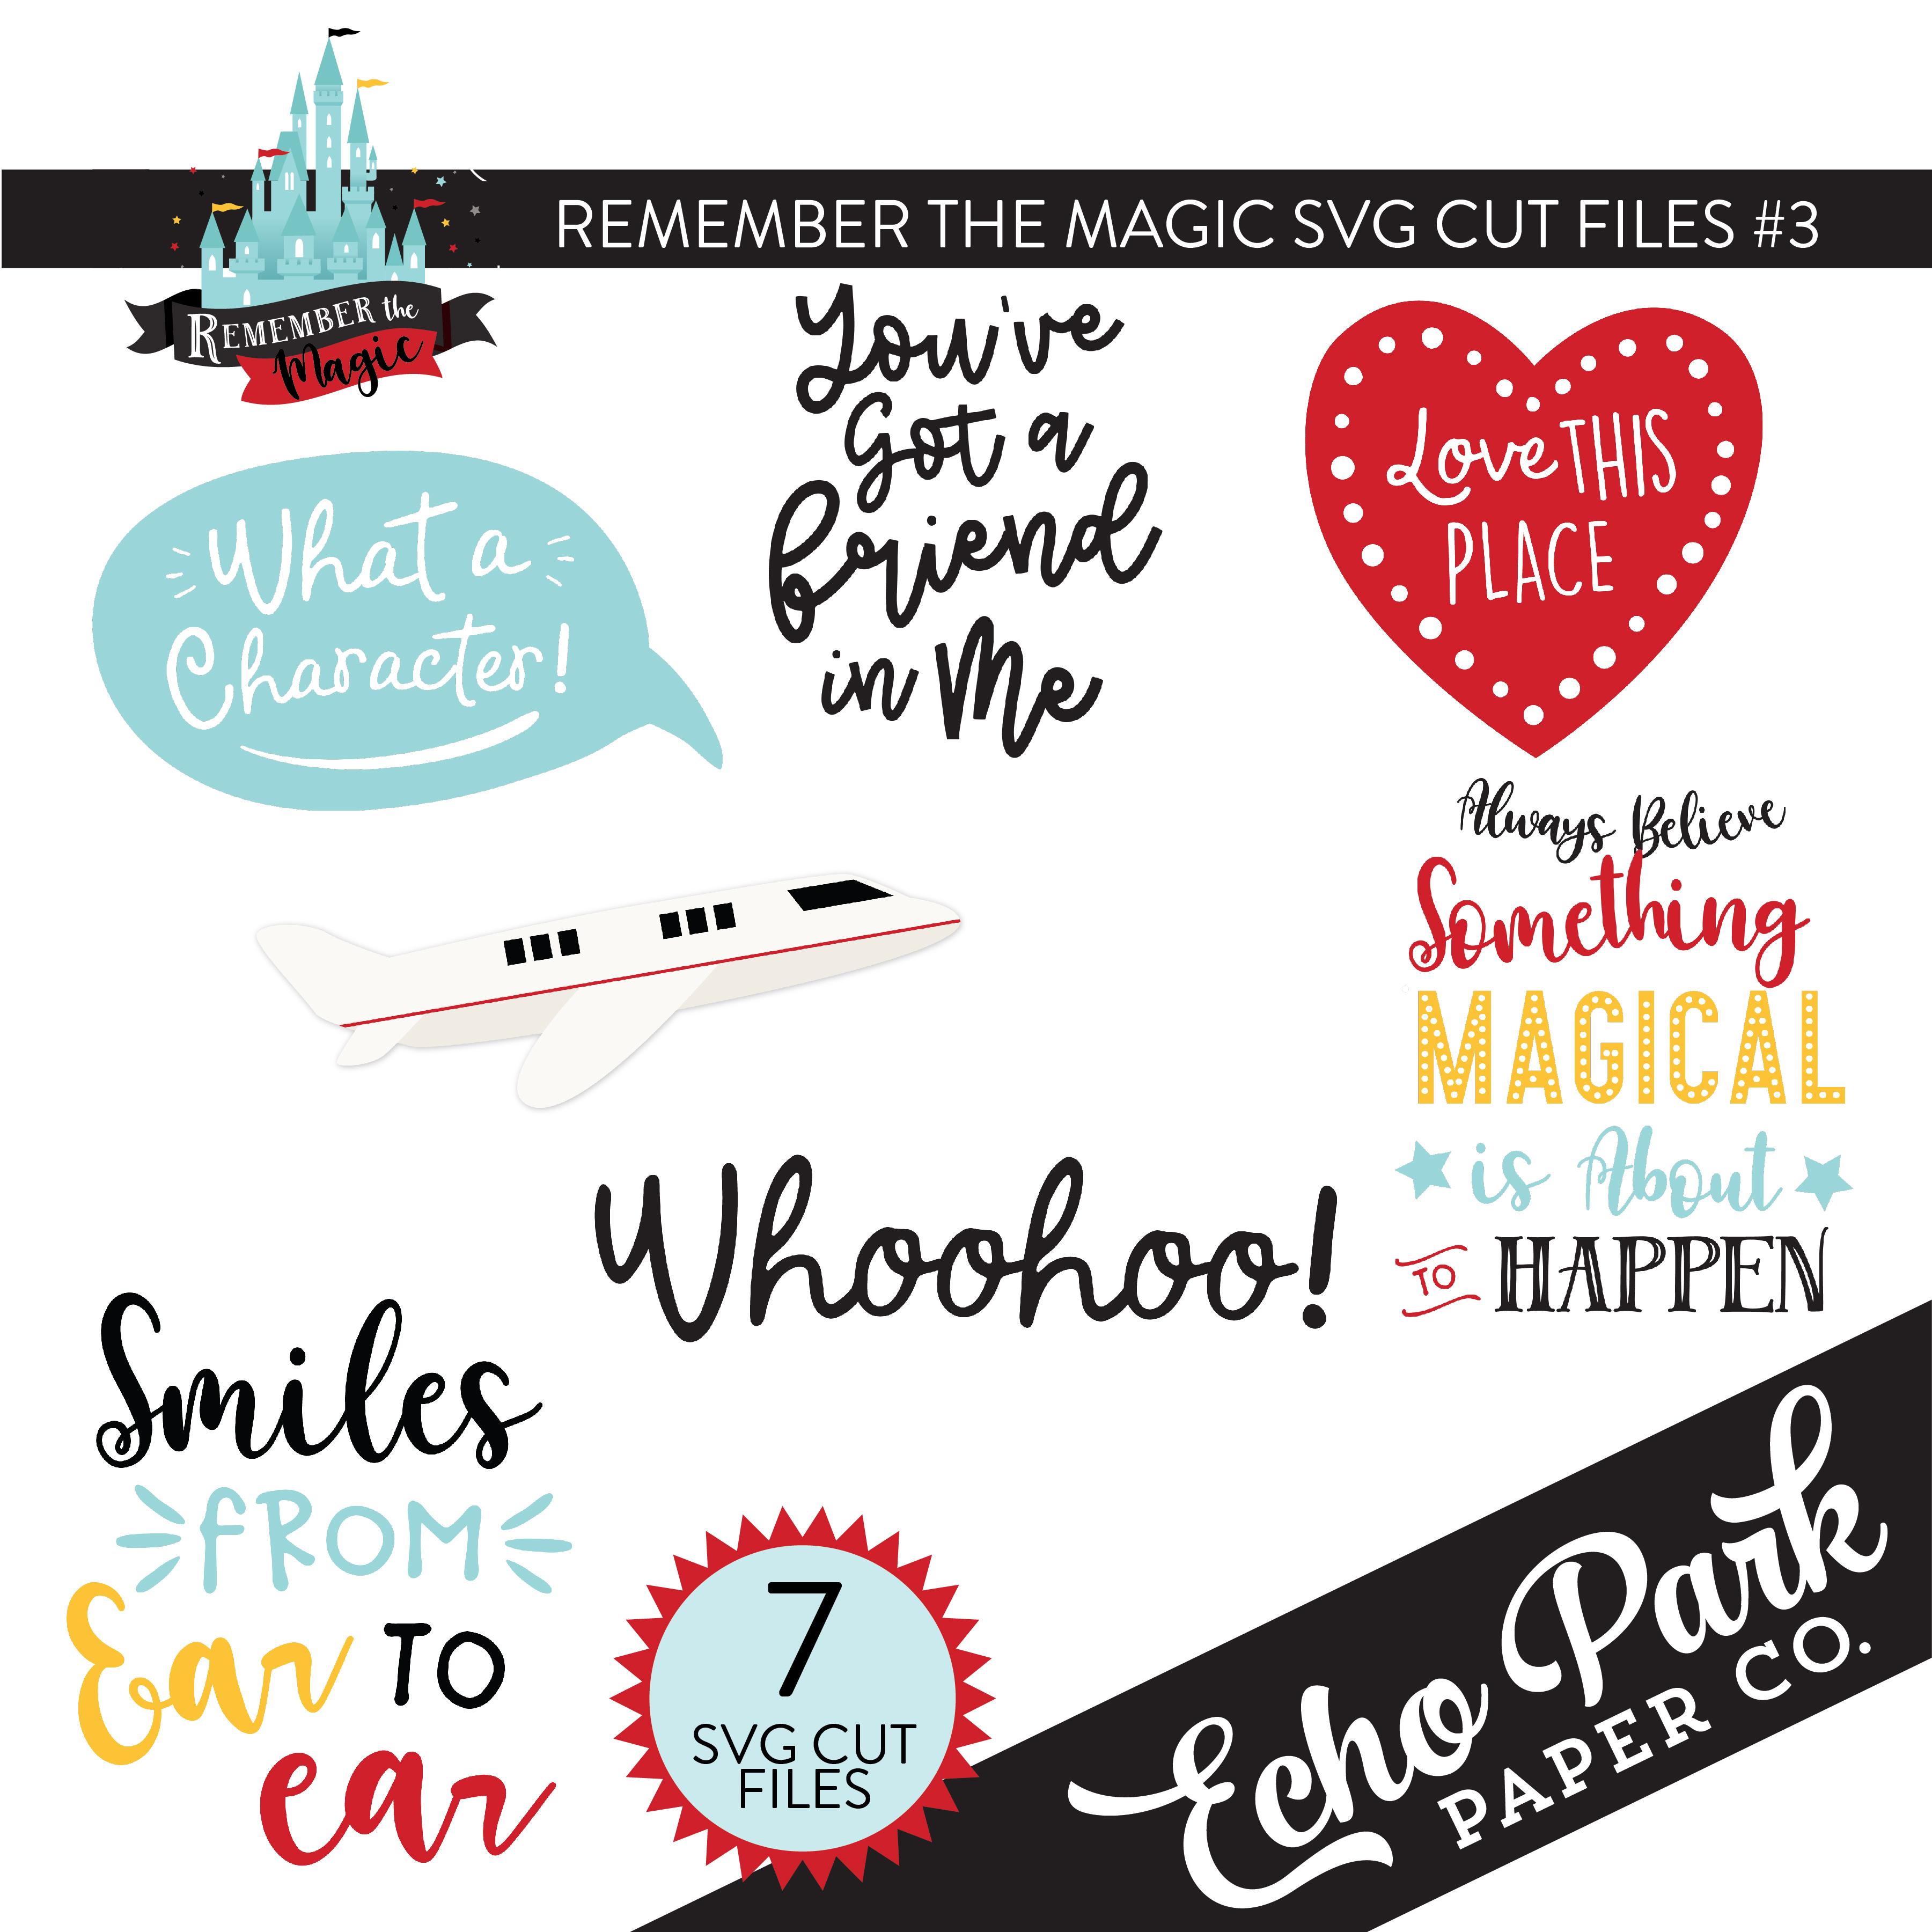 Remember The Magic SVG Cut Files #3